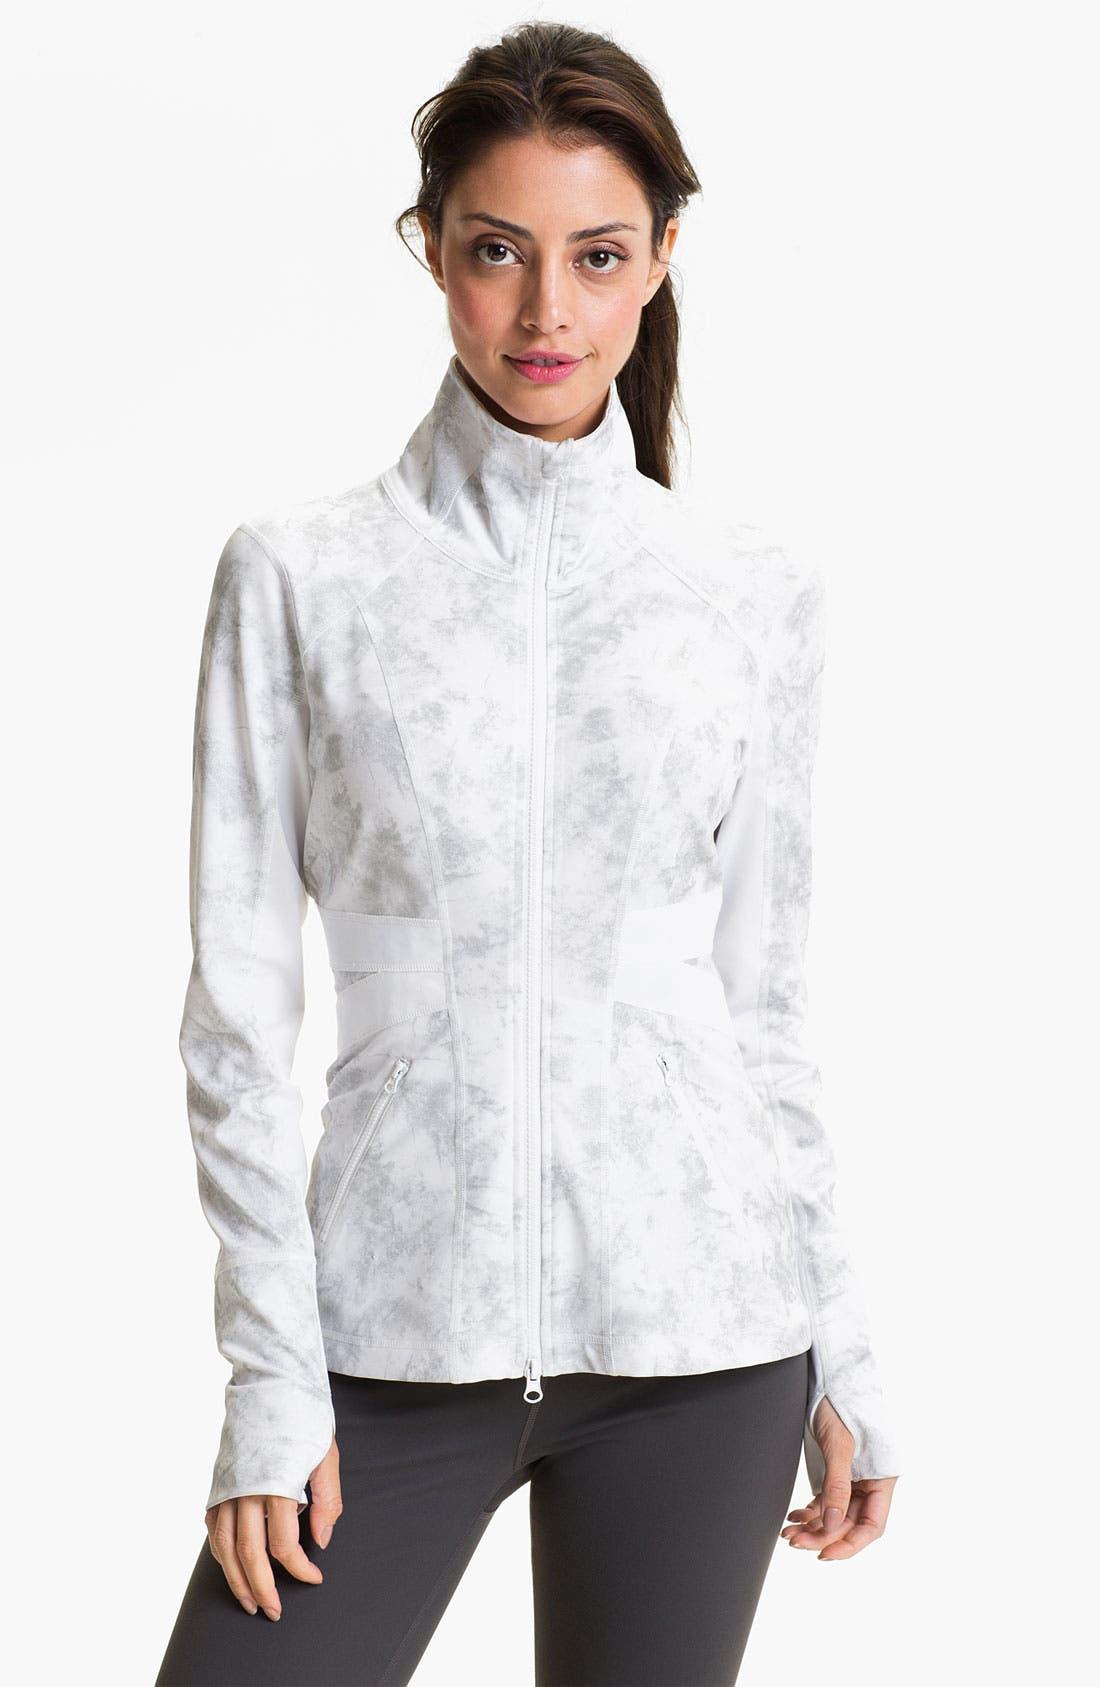 Alternate Image 1 Selected - Zella 'Karin' Fitted Jacket